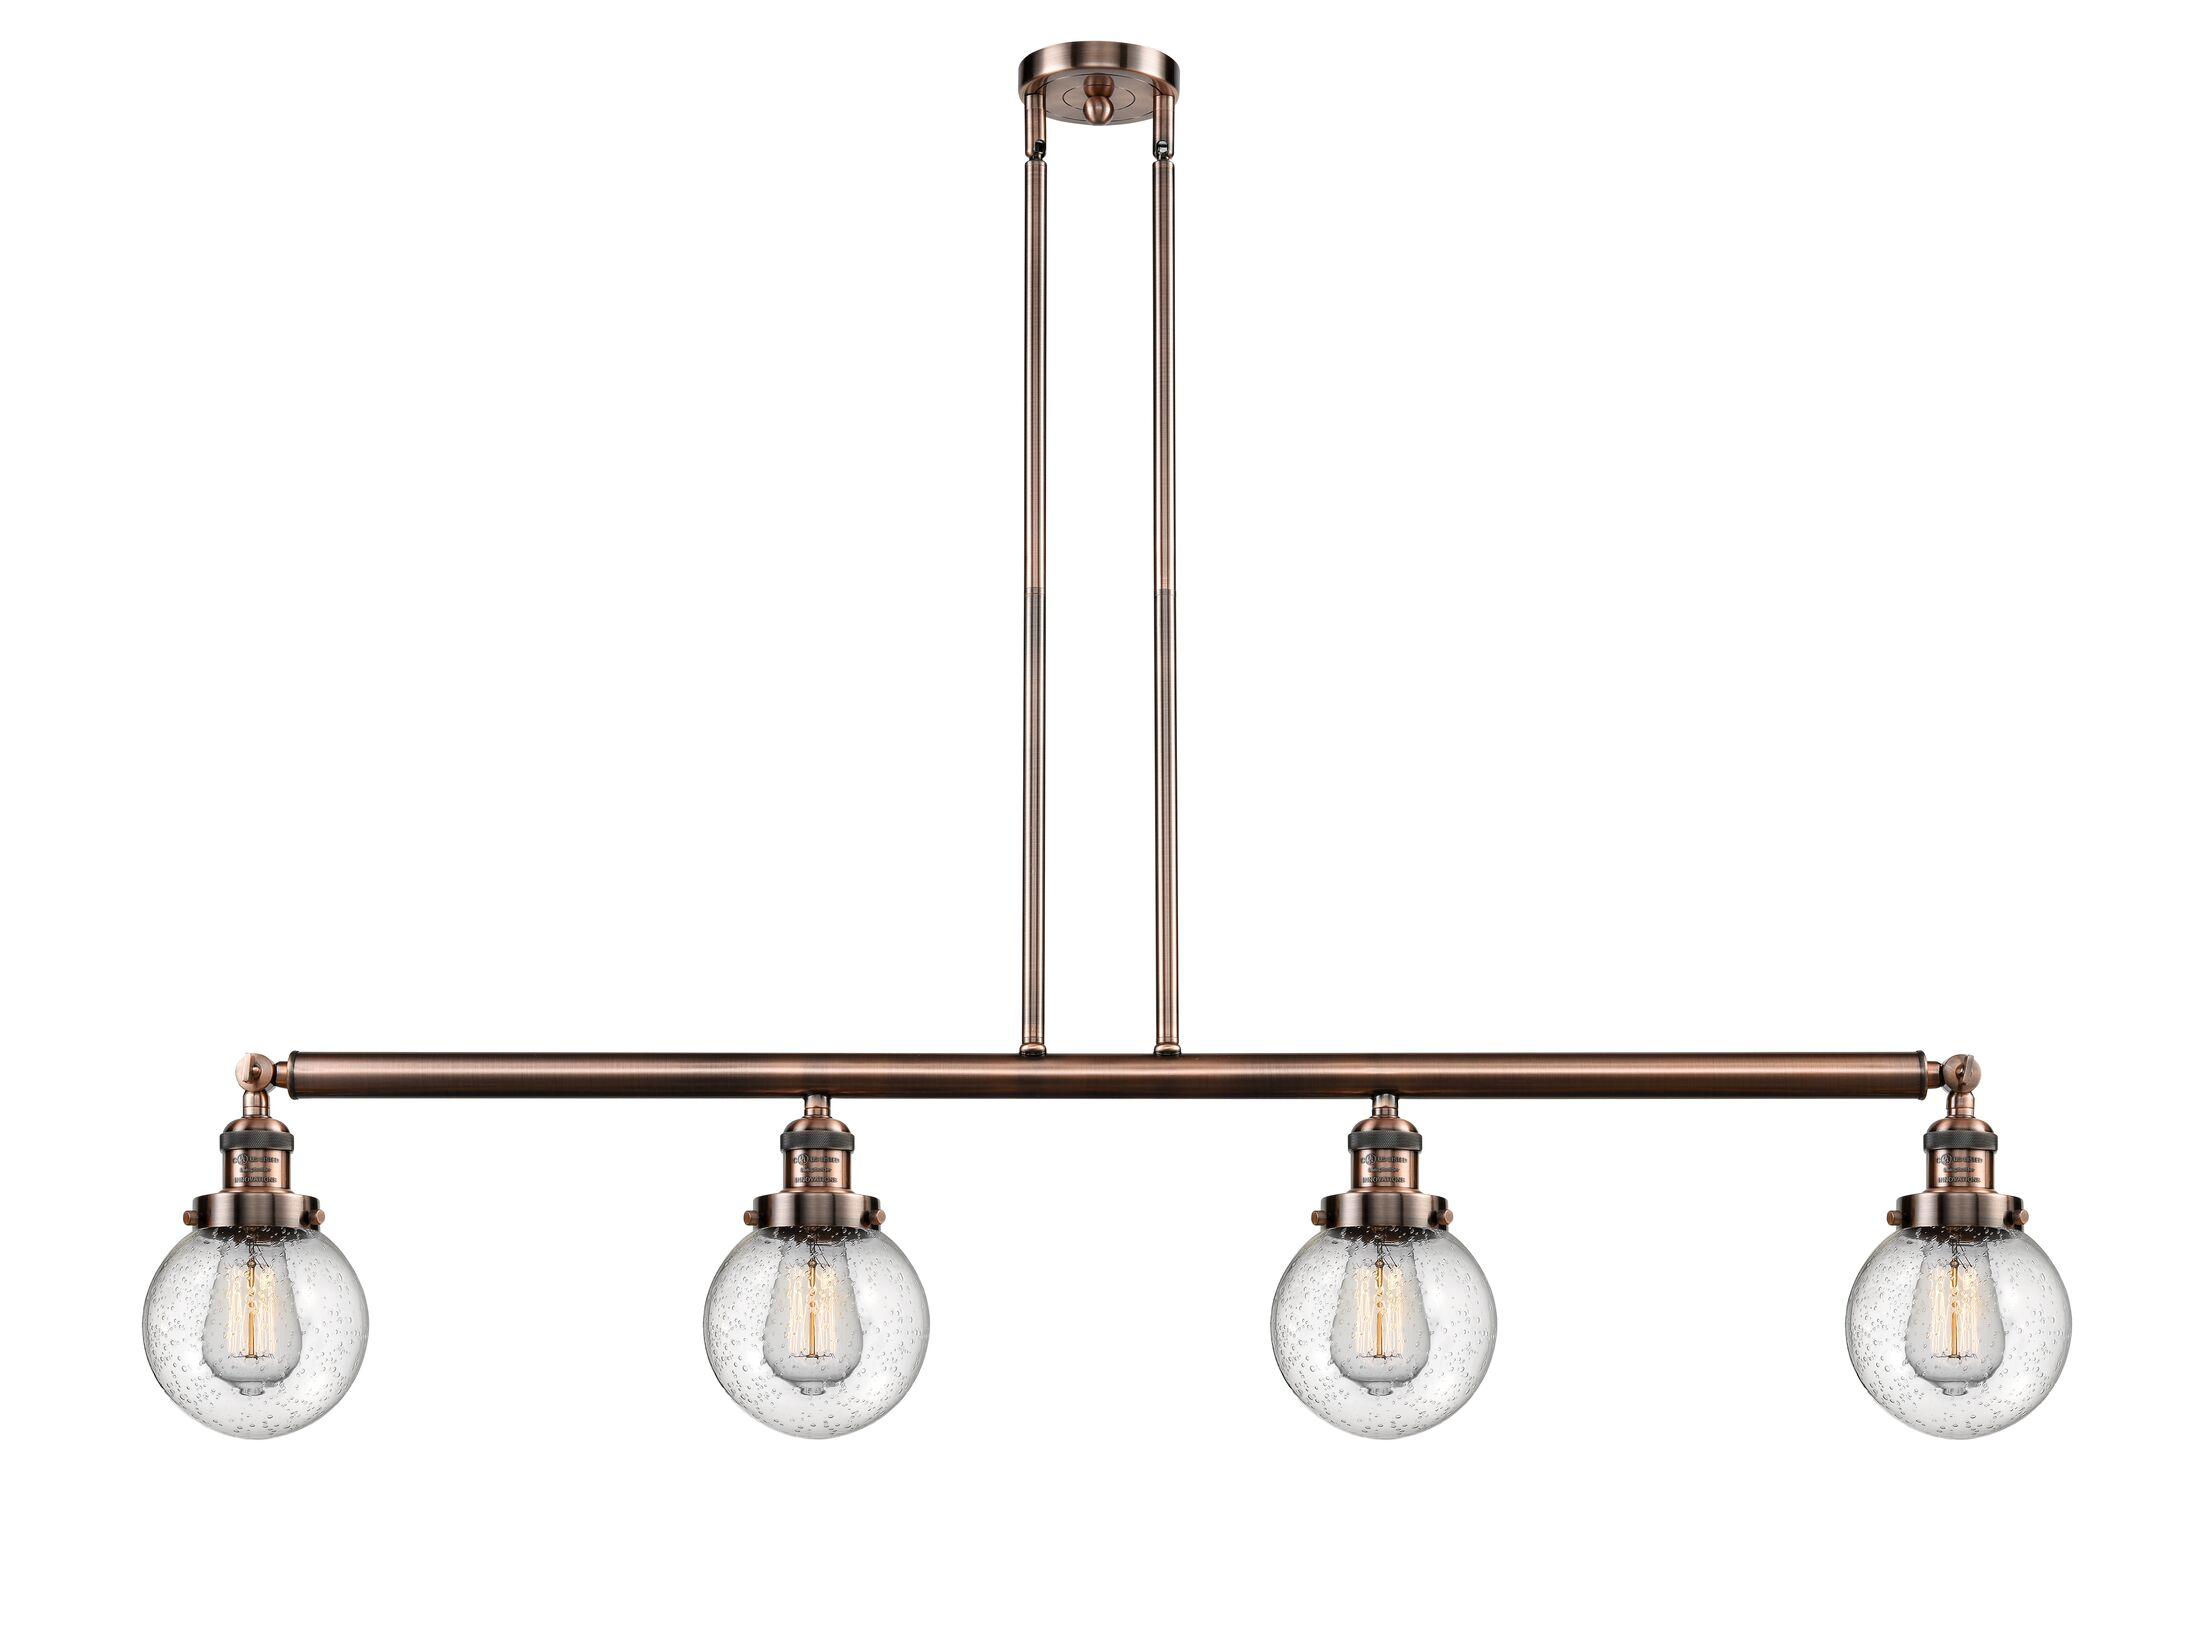 Jackeline 4-Light Kitchen Island Pendant Finish: Antique Brass, Bulb Type: LED, Shade Color: Clear